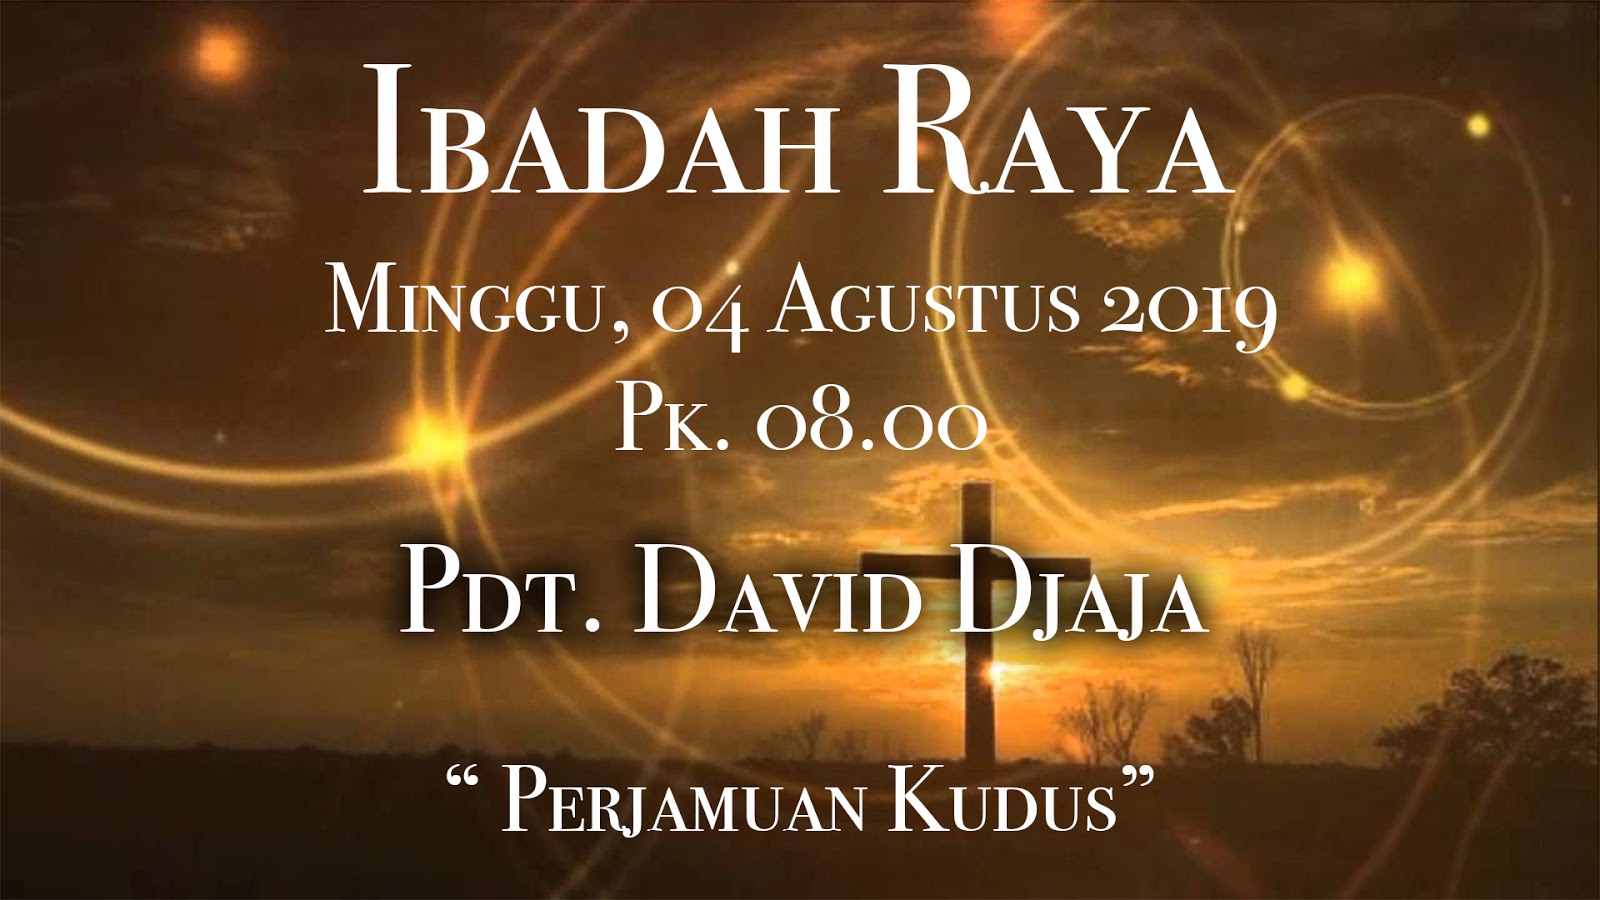 ibadah raya gsja sword 4 Agustus 2019